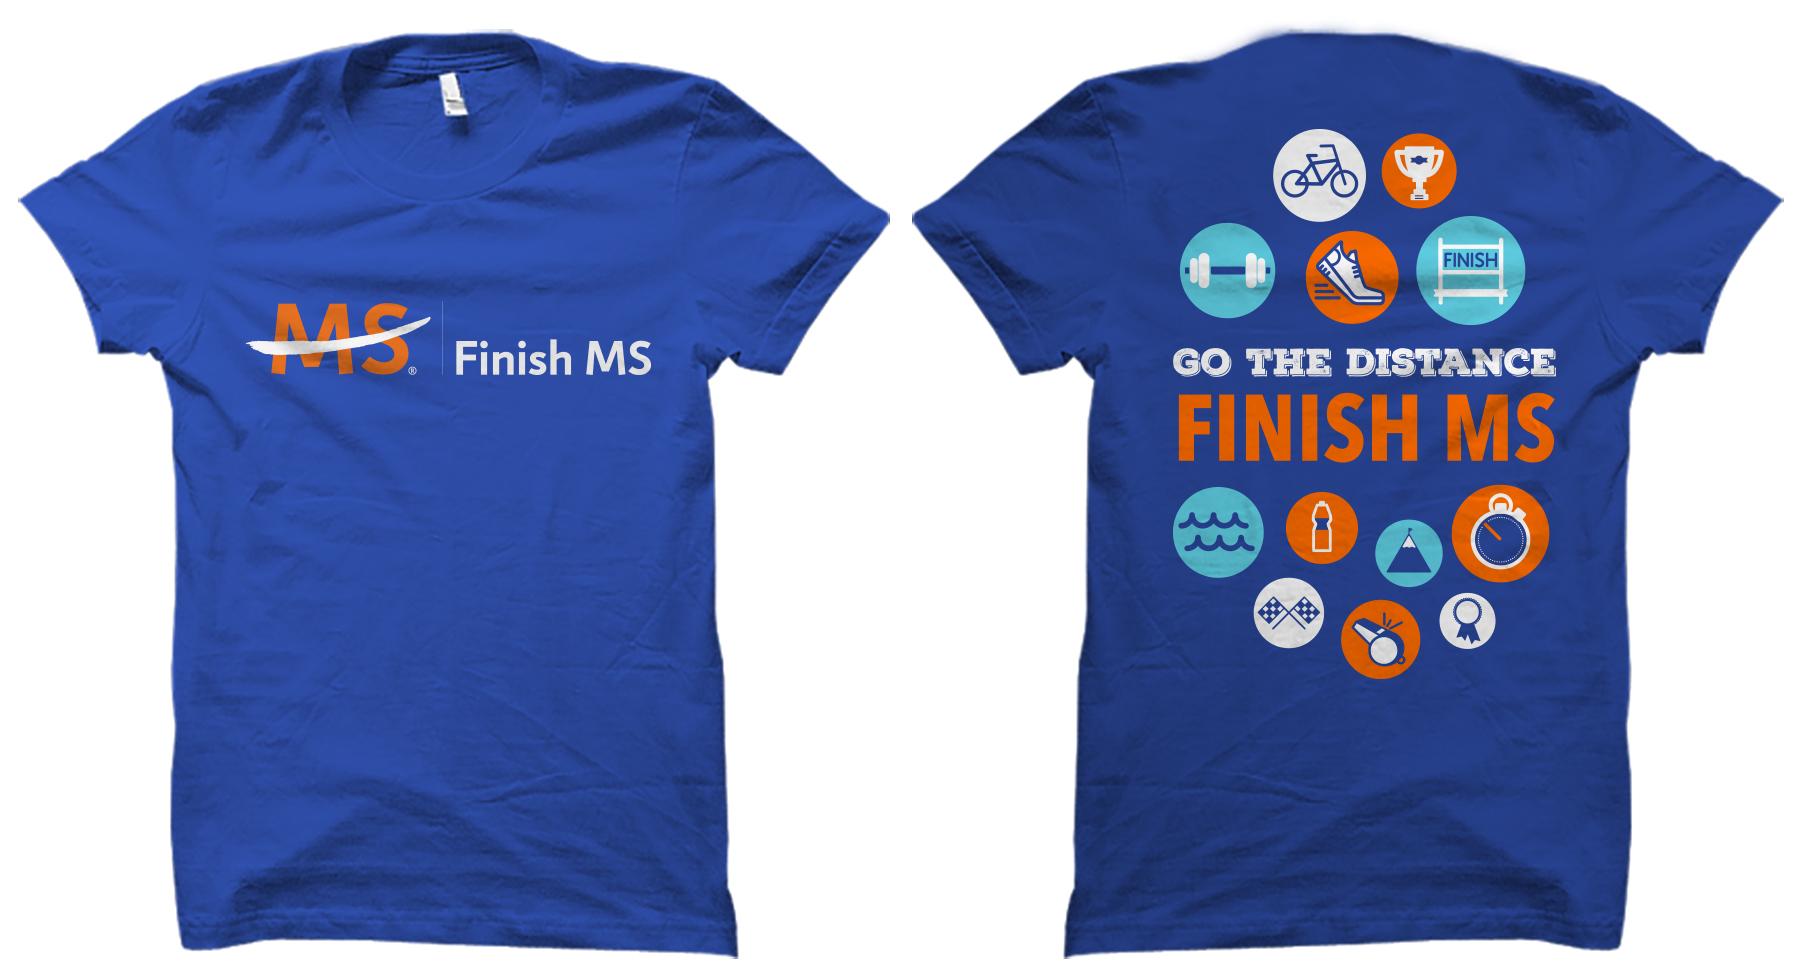 FinishMSTshirt.jpg